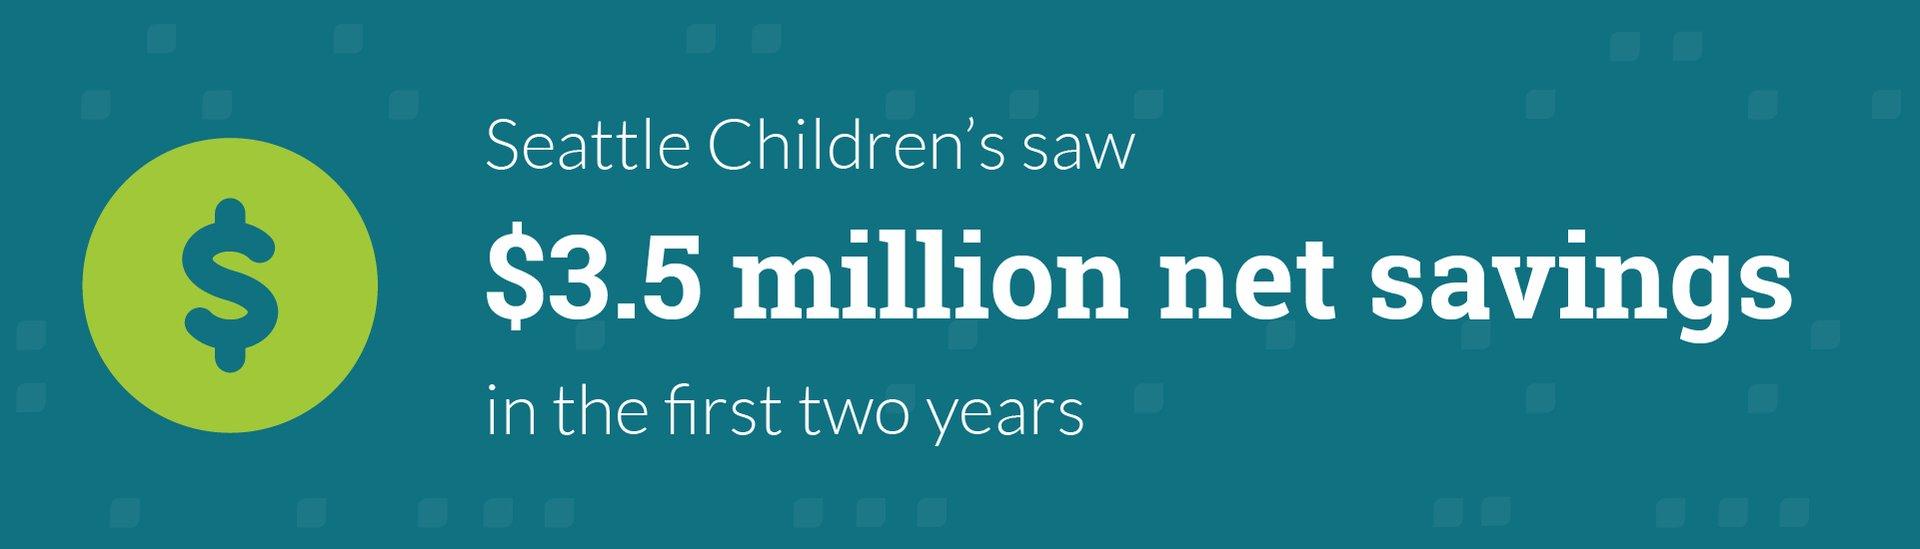 seattle-childrens-savings_graphic